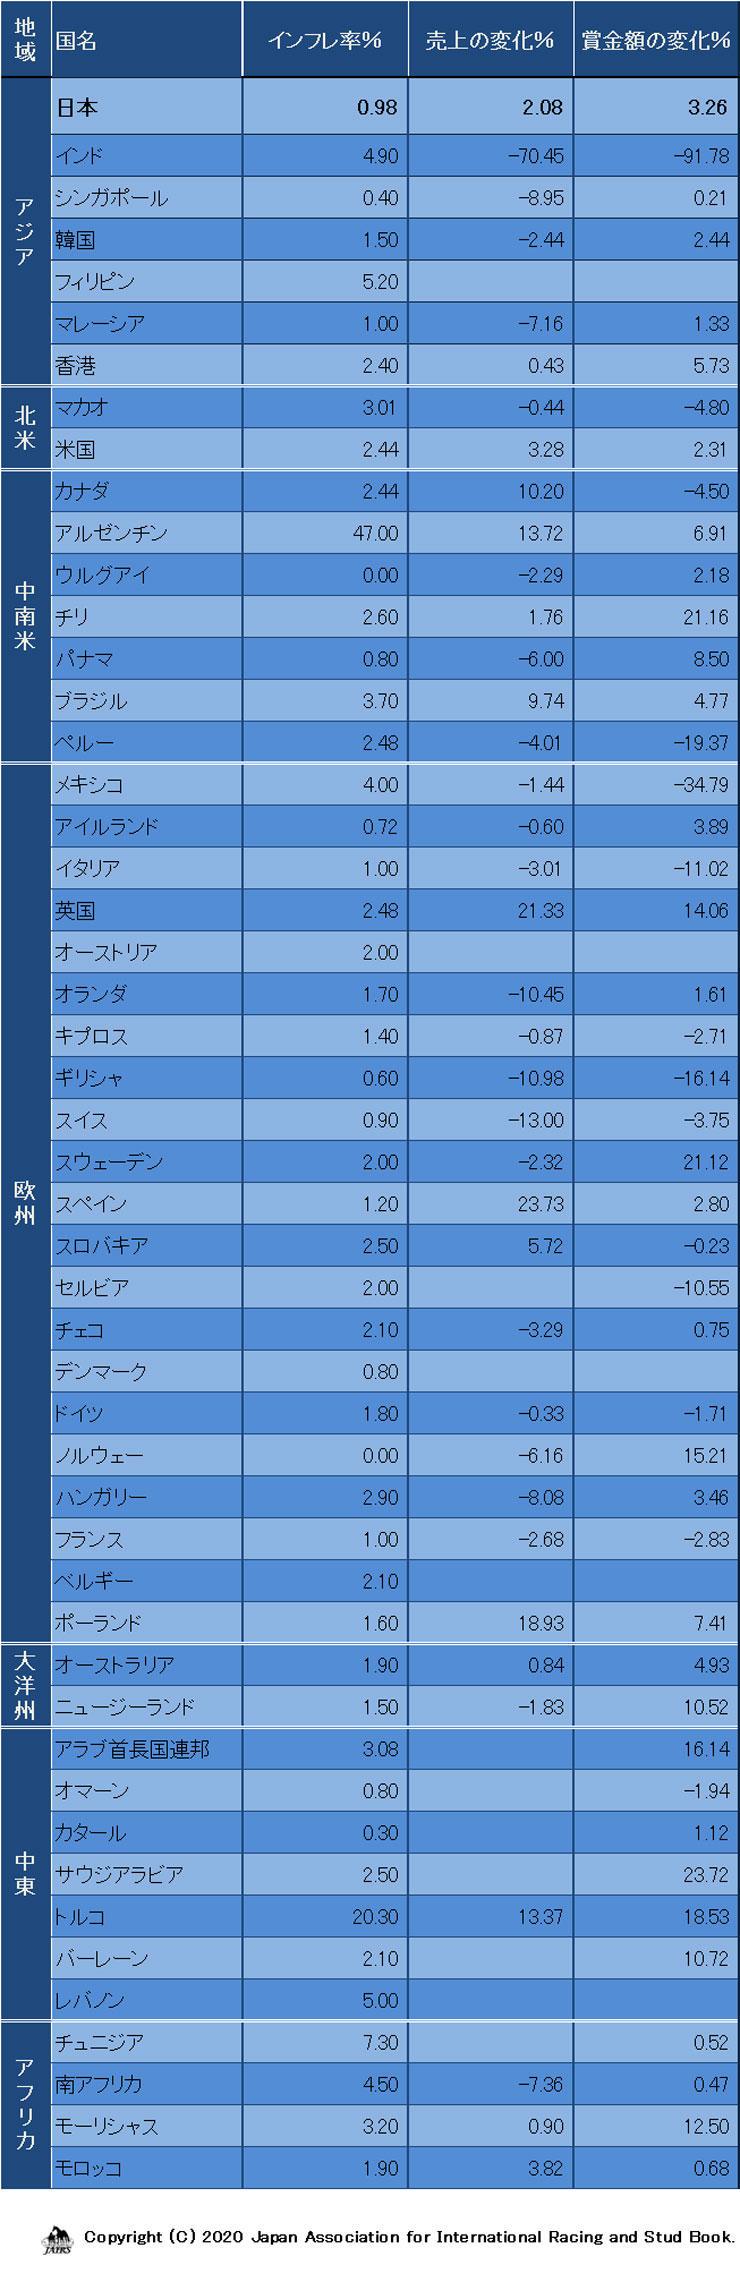 06inflation2018-01.jpg